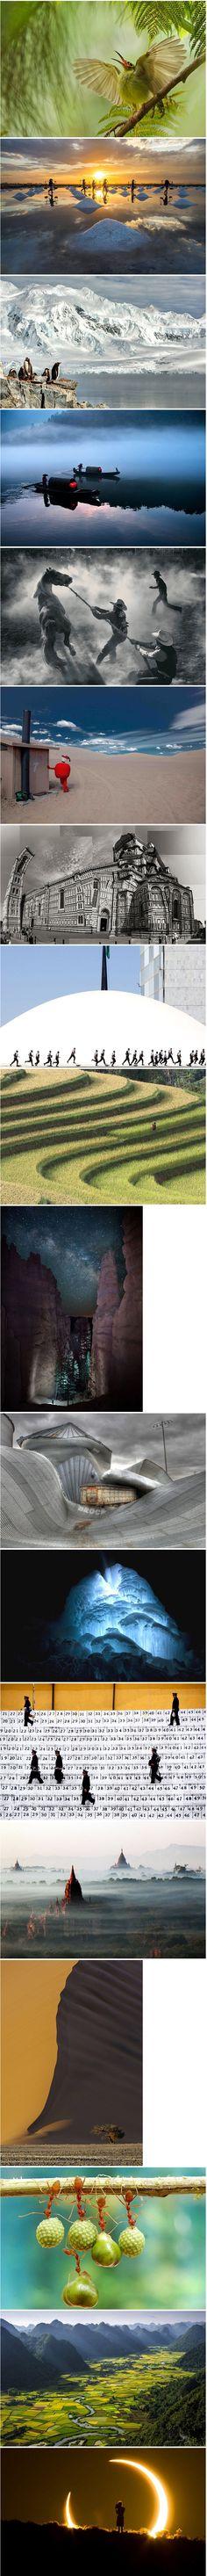 Photo contest by Smithsonian Magazine